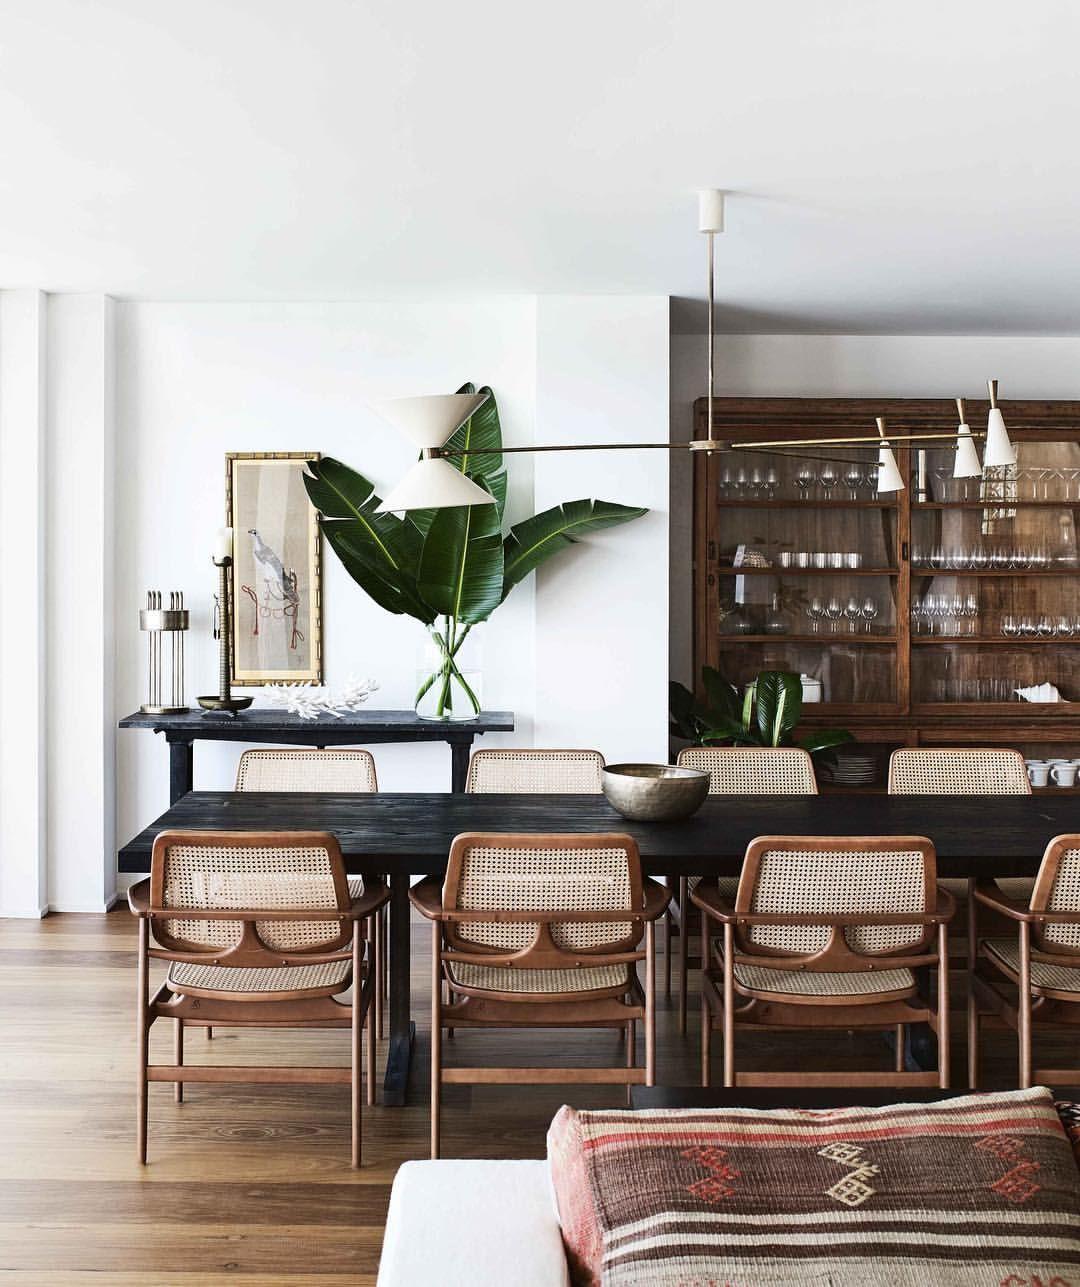 Vogue Living On Instagram Interior Designer Sarahdavisoninteriors Overhauled This Waterfront P Dining Room Decor Modern Modern Dining Room Dining Room Decor